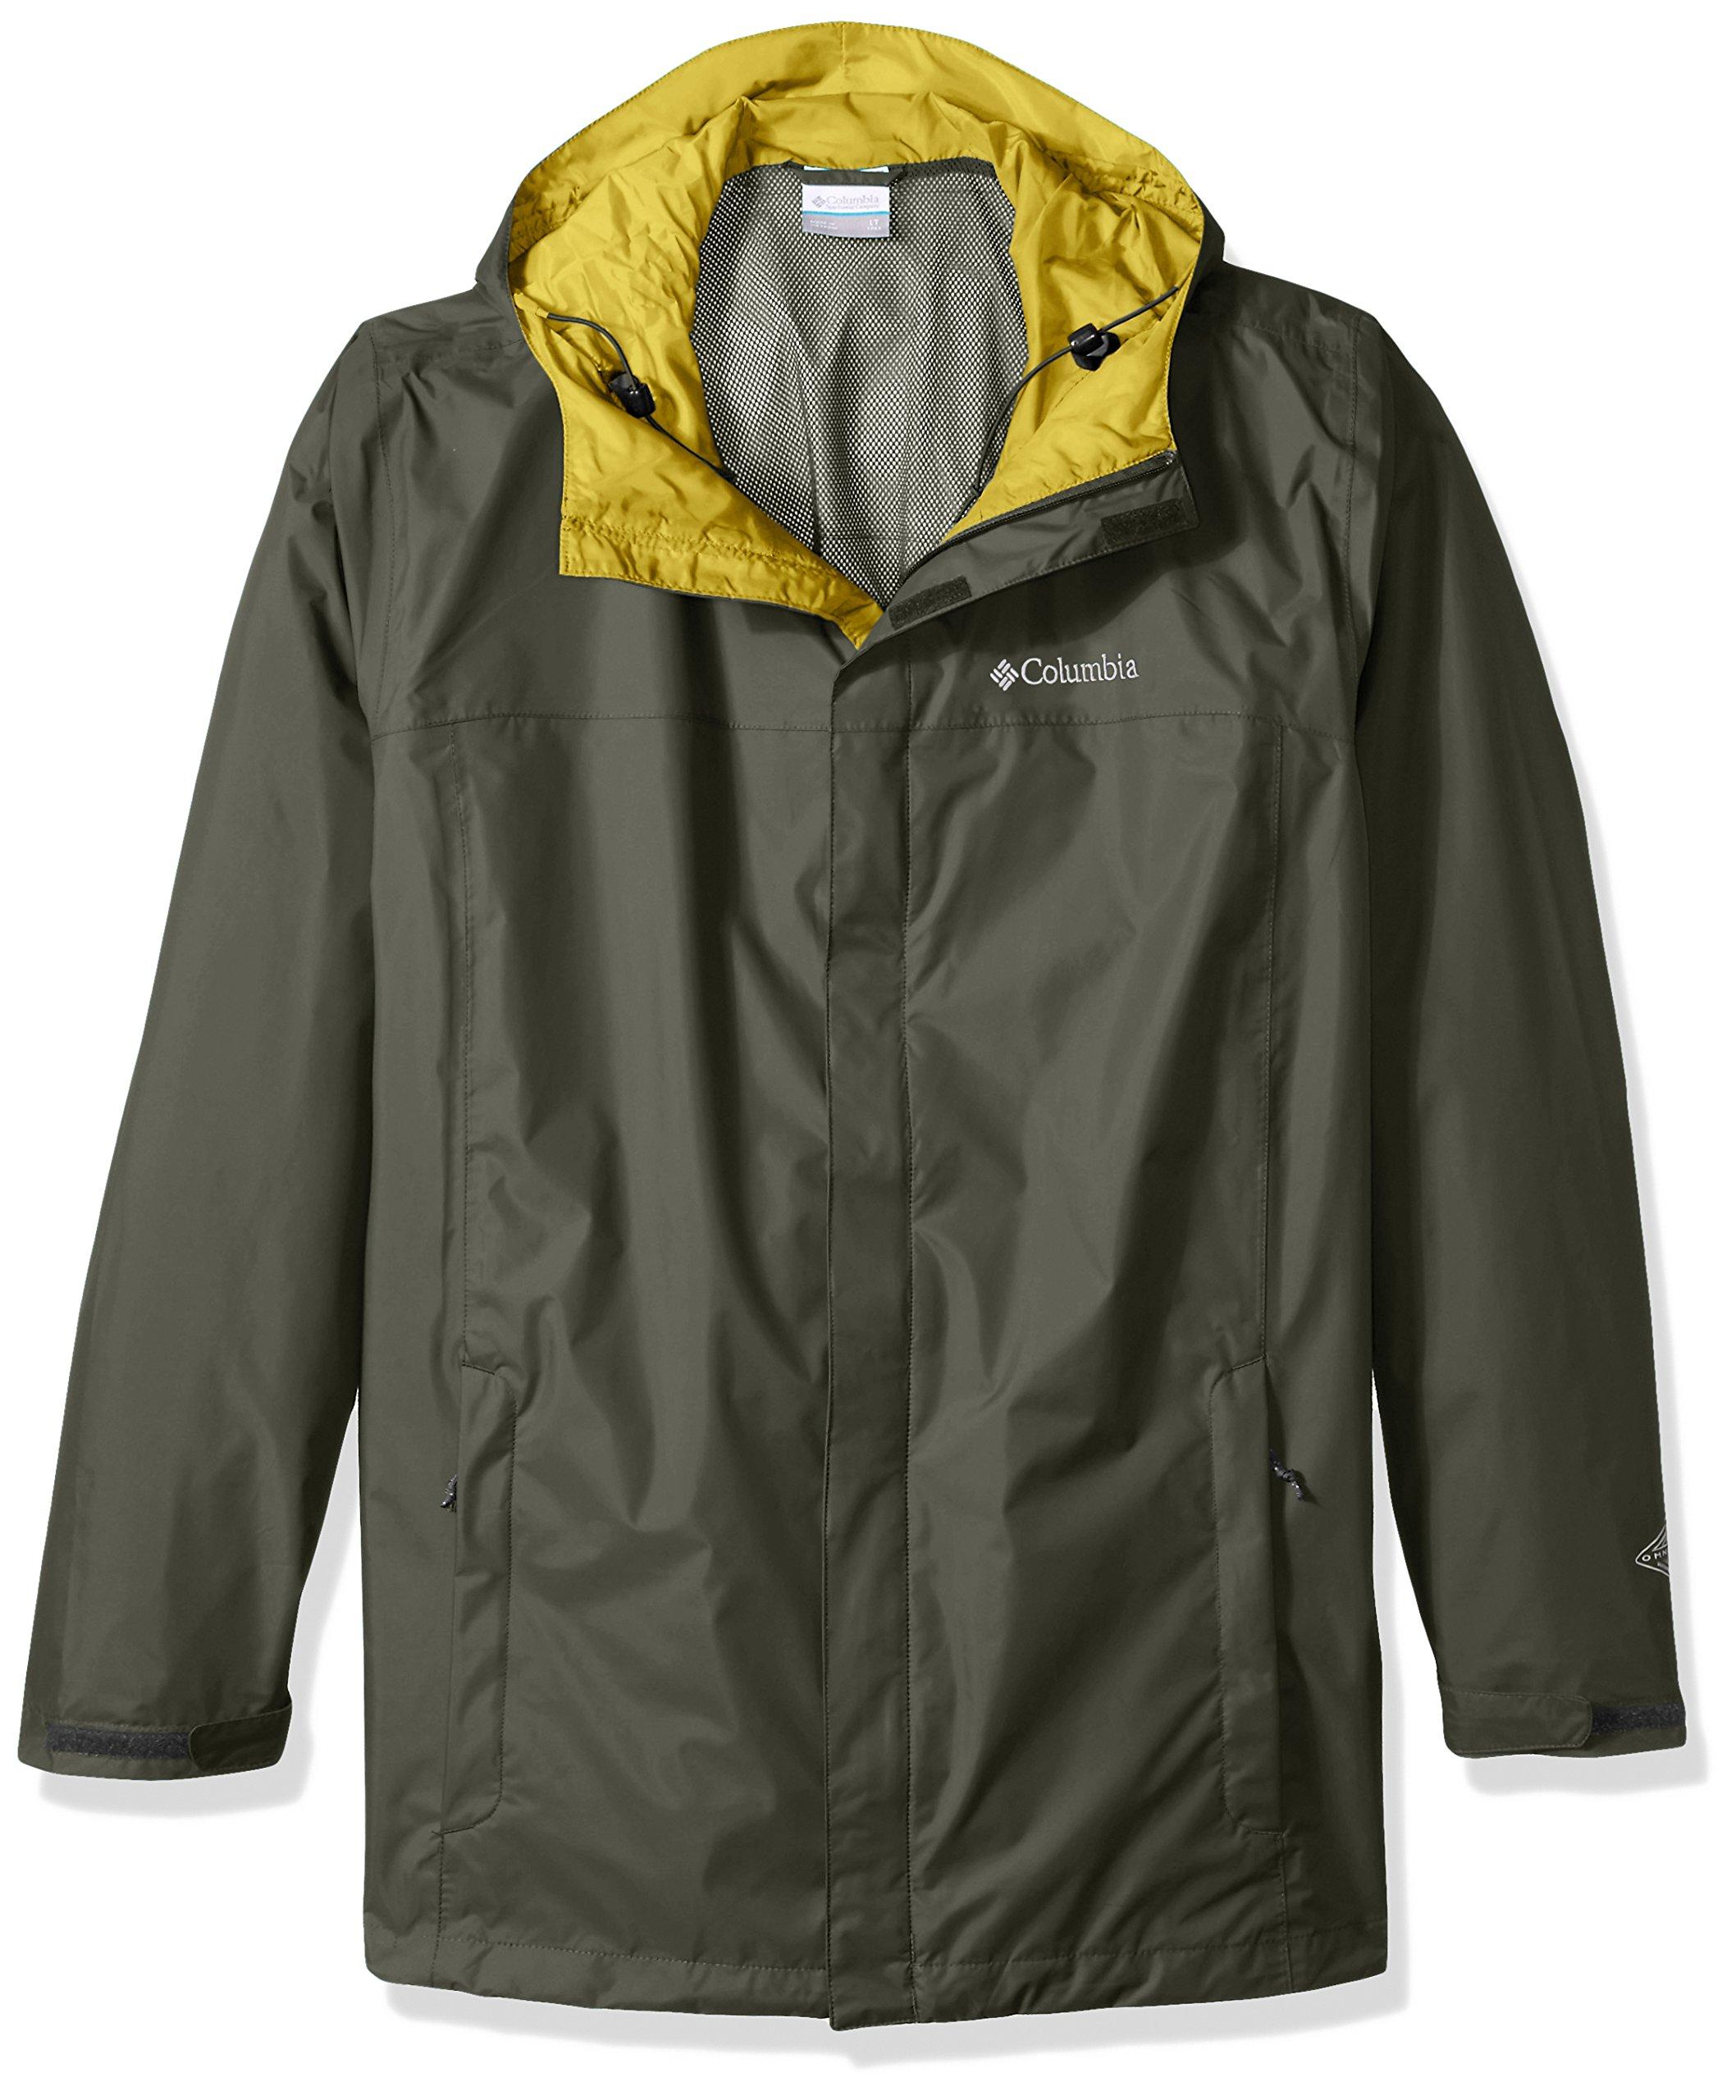 Columbia Men's Big and Watertight Ii Packable Rain Jacket, Gravel, 3X Tall